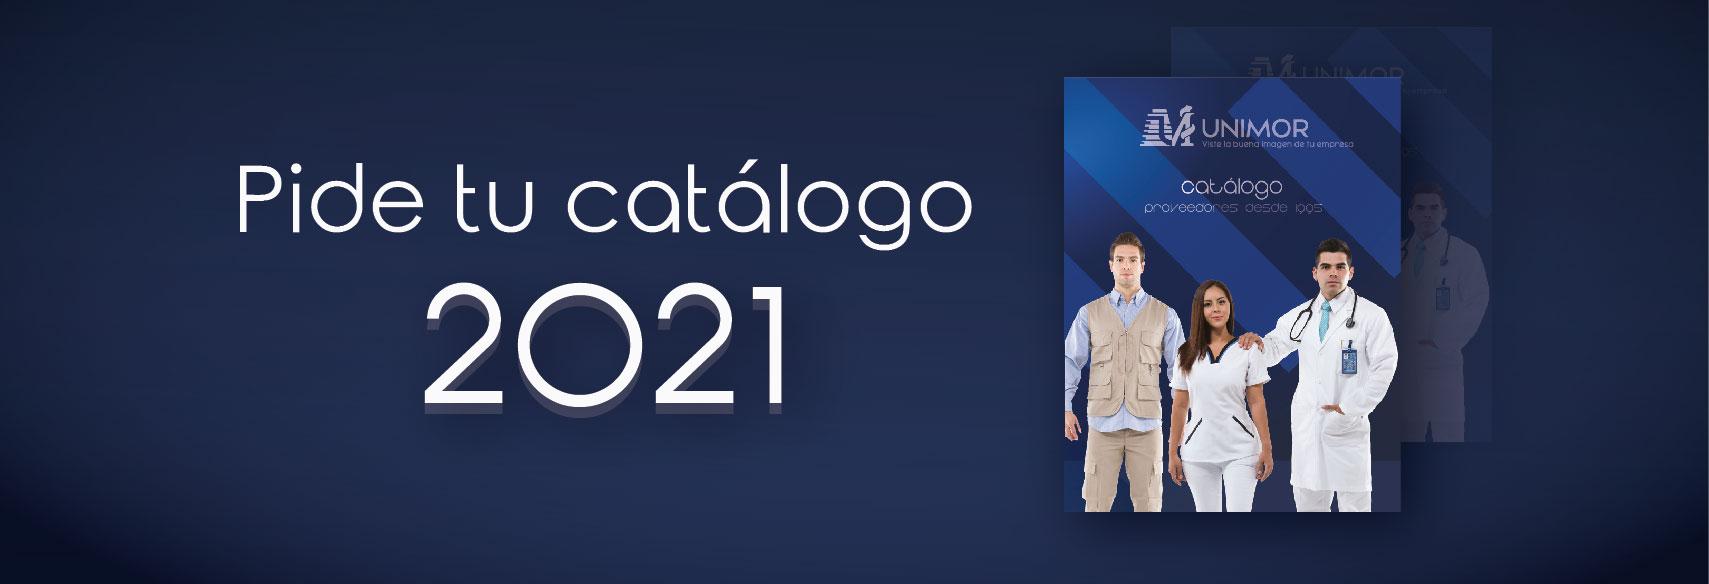 slide pide tu catalogo-01